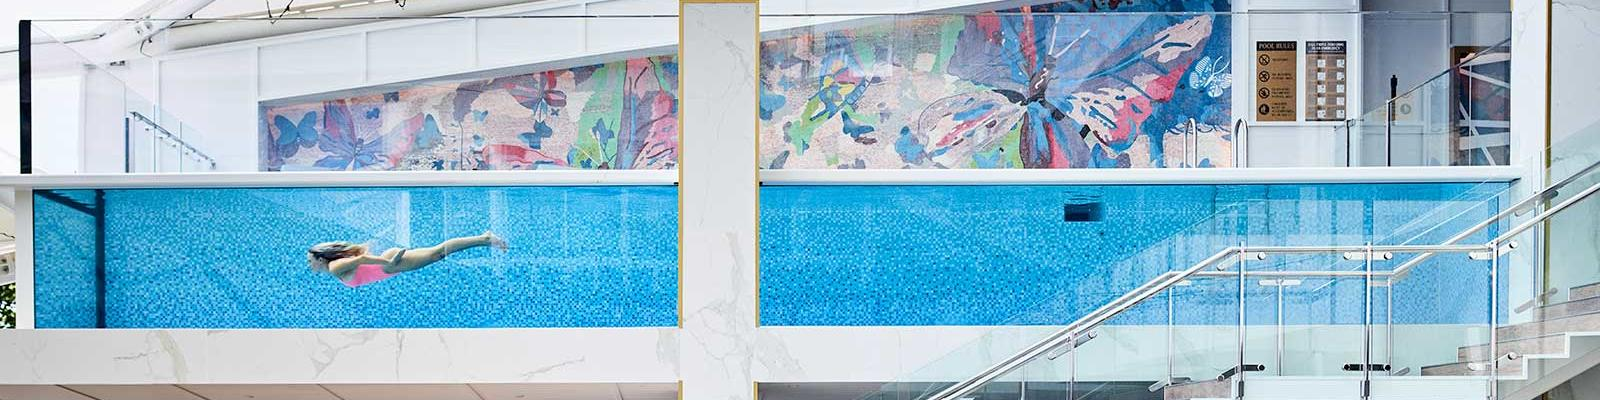 Flynn hotel cairns pool